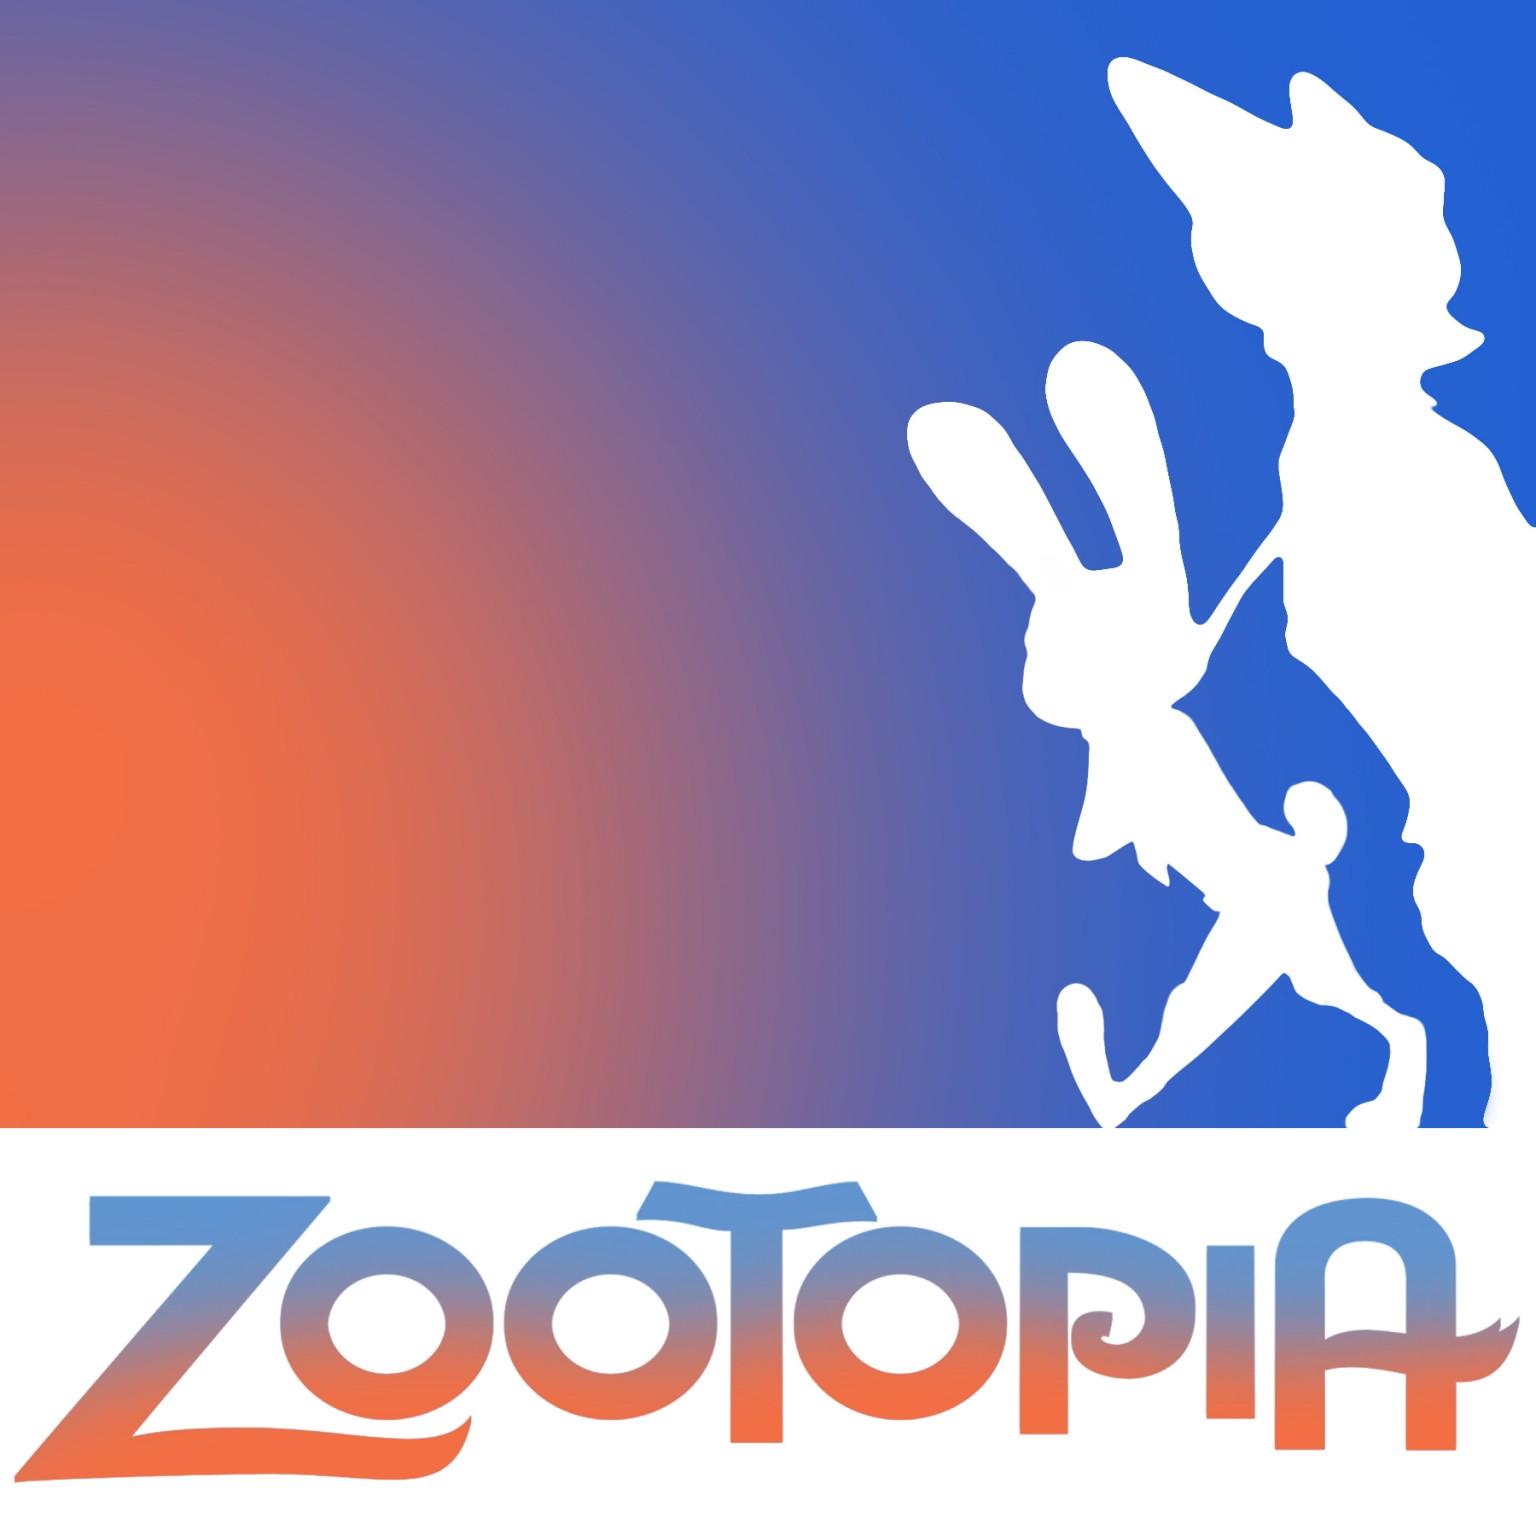 1 Zootopia_BlueOrange